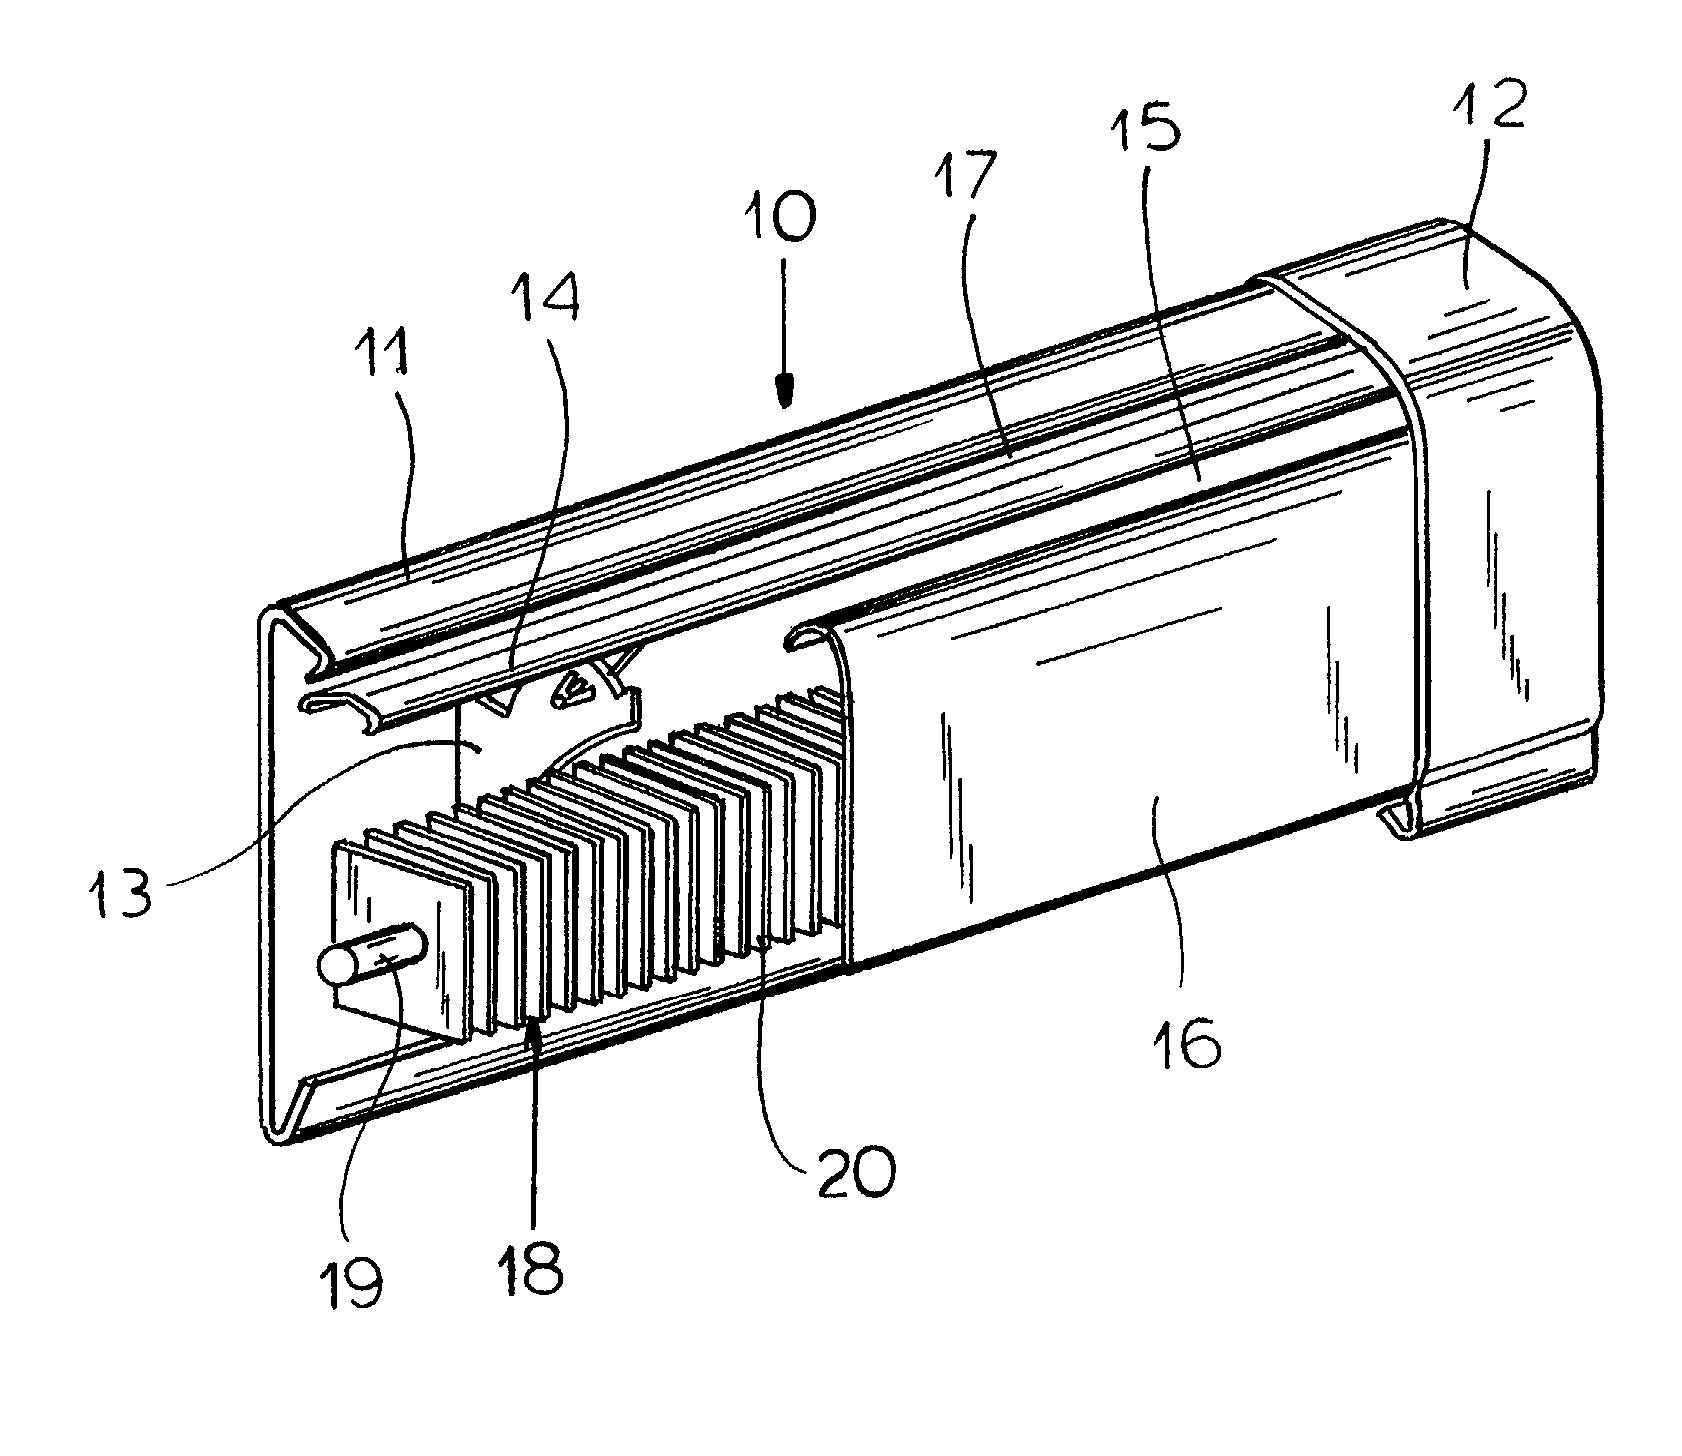 electric baseboard heater wiring diagram 18 hp intek engine dryer